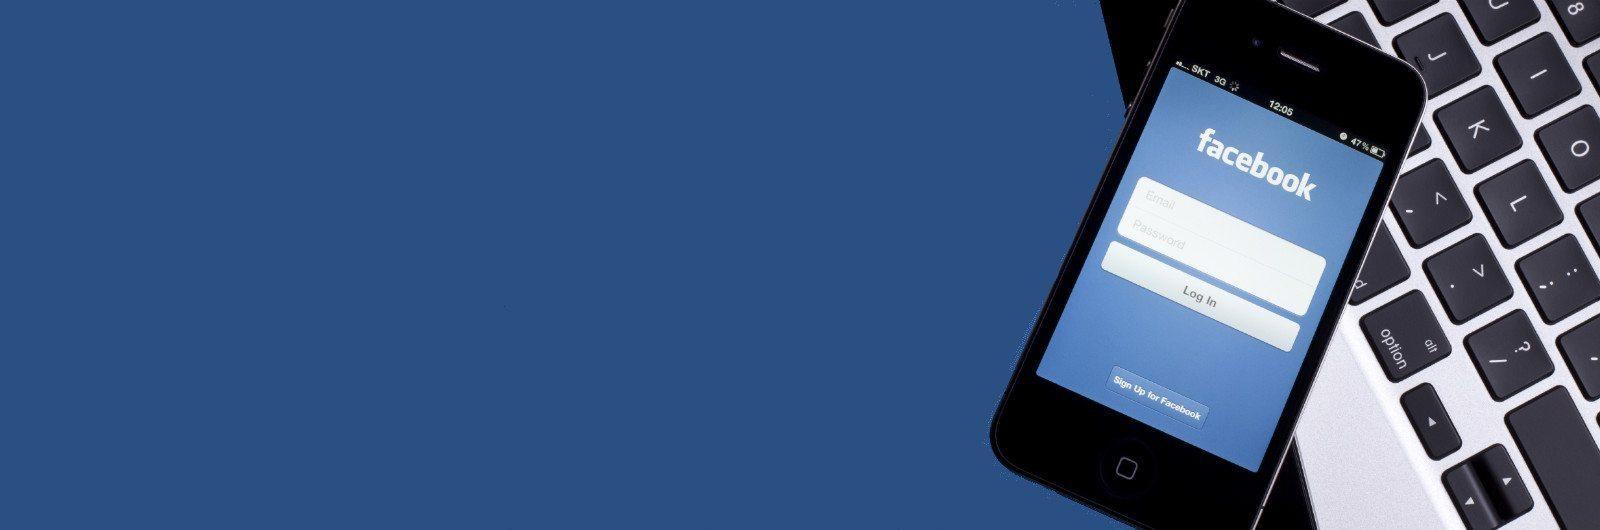 Facebook-Marketing-1600x530.jpg